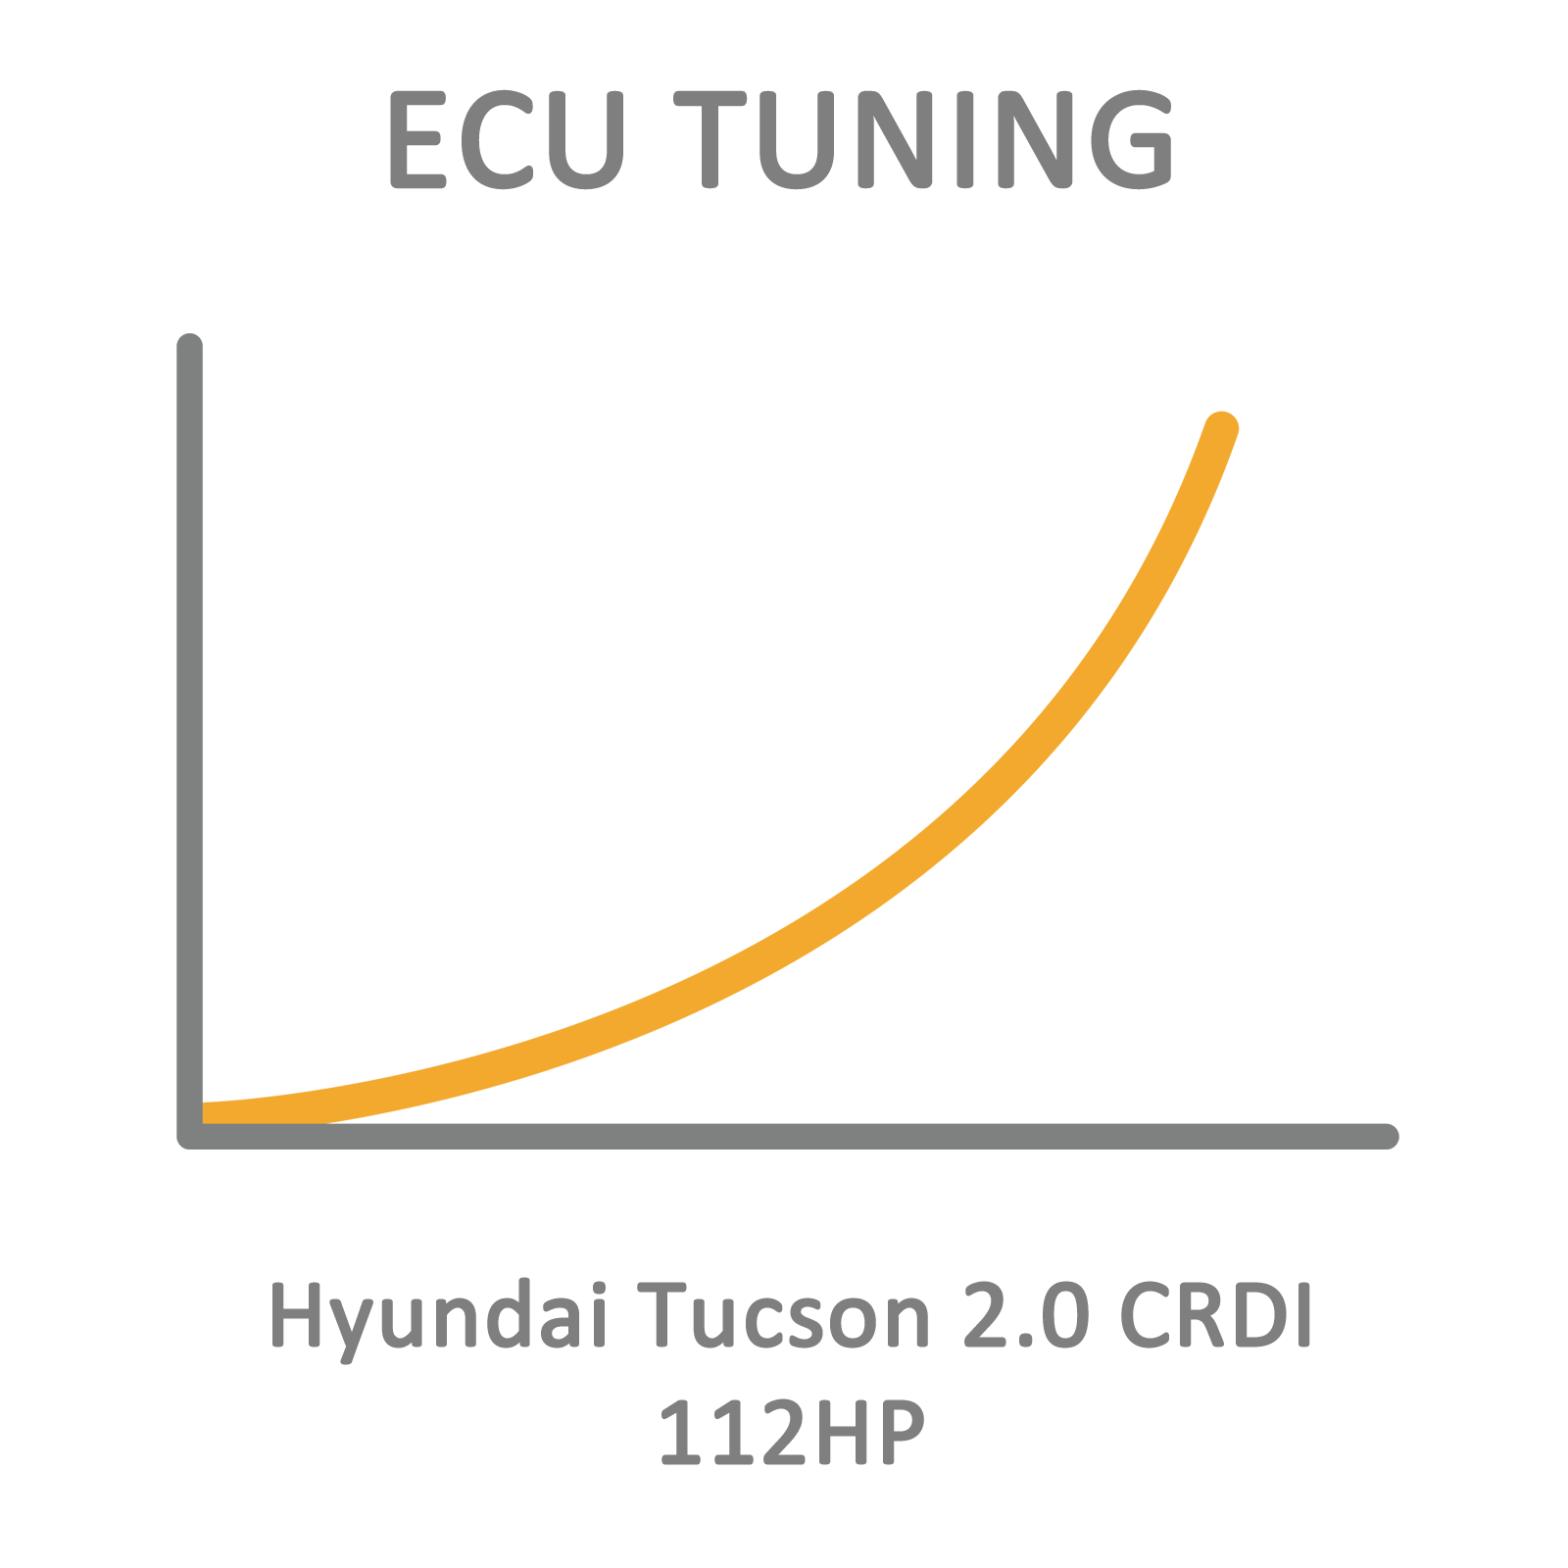 Hyundai Tucson 2.0 CRDI 112HP ECU Tuning Remapping Programming